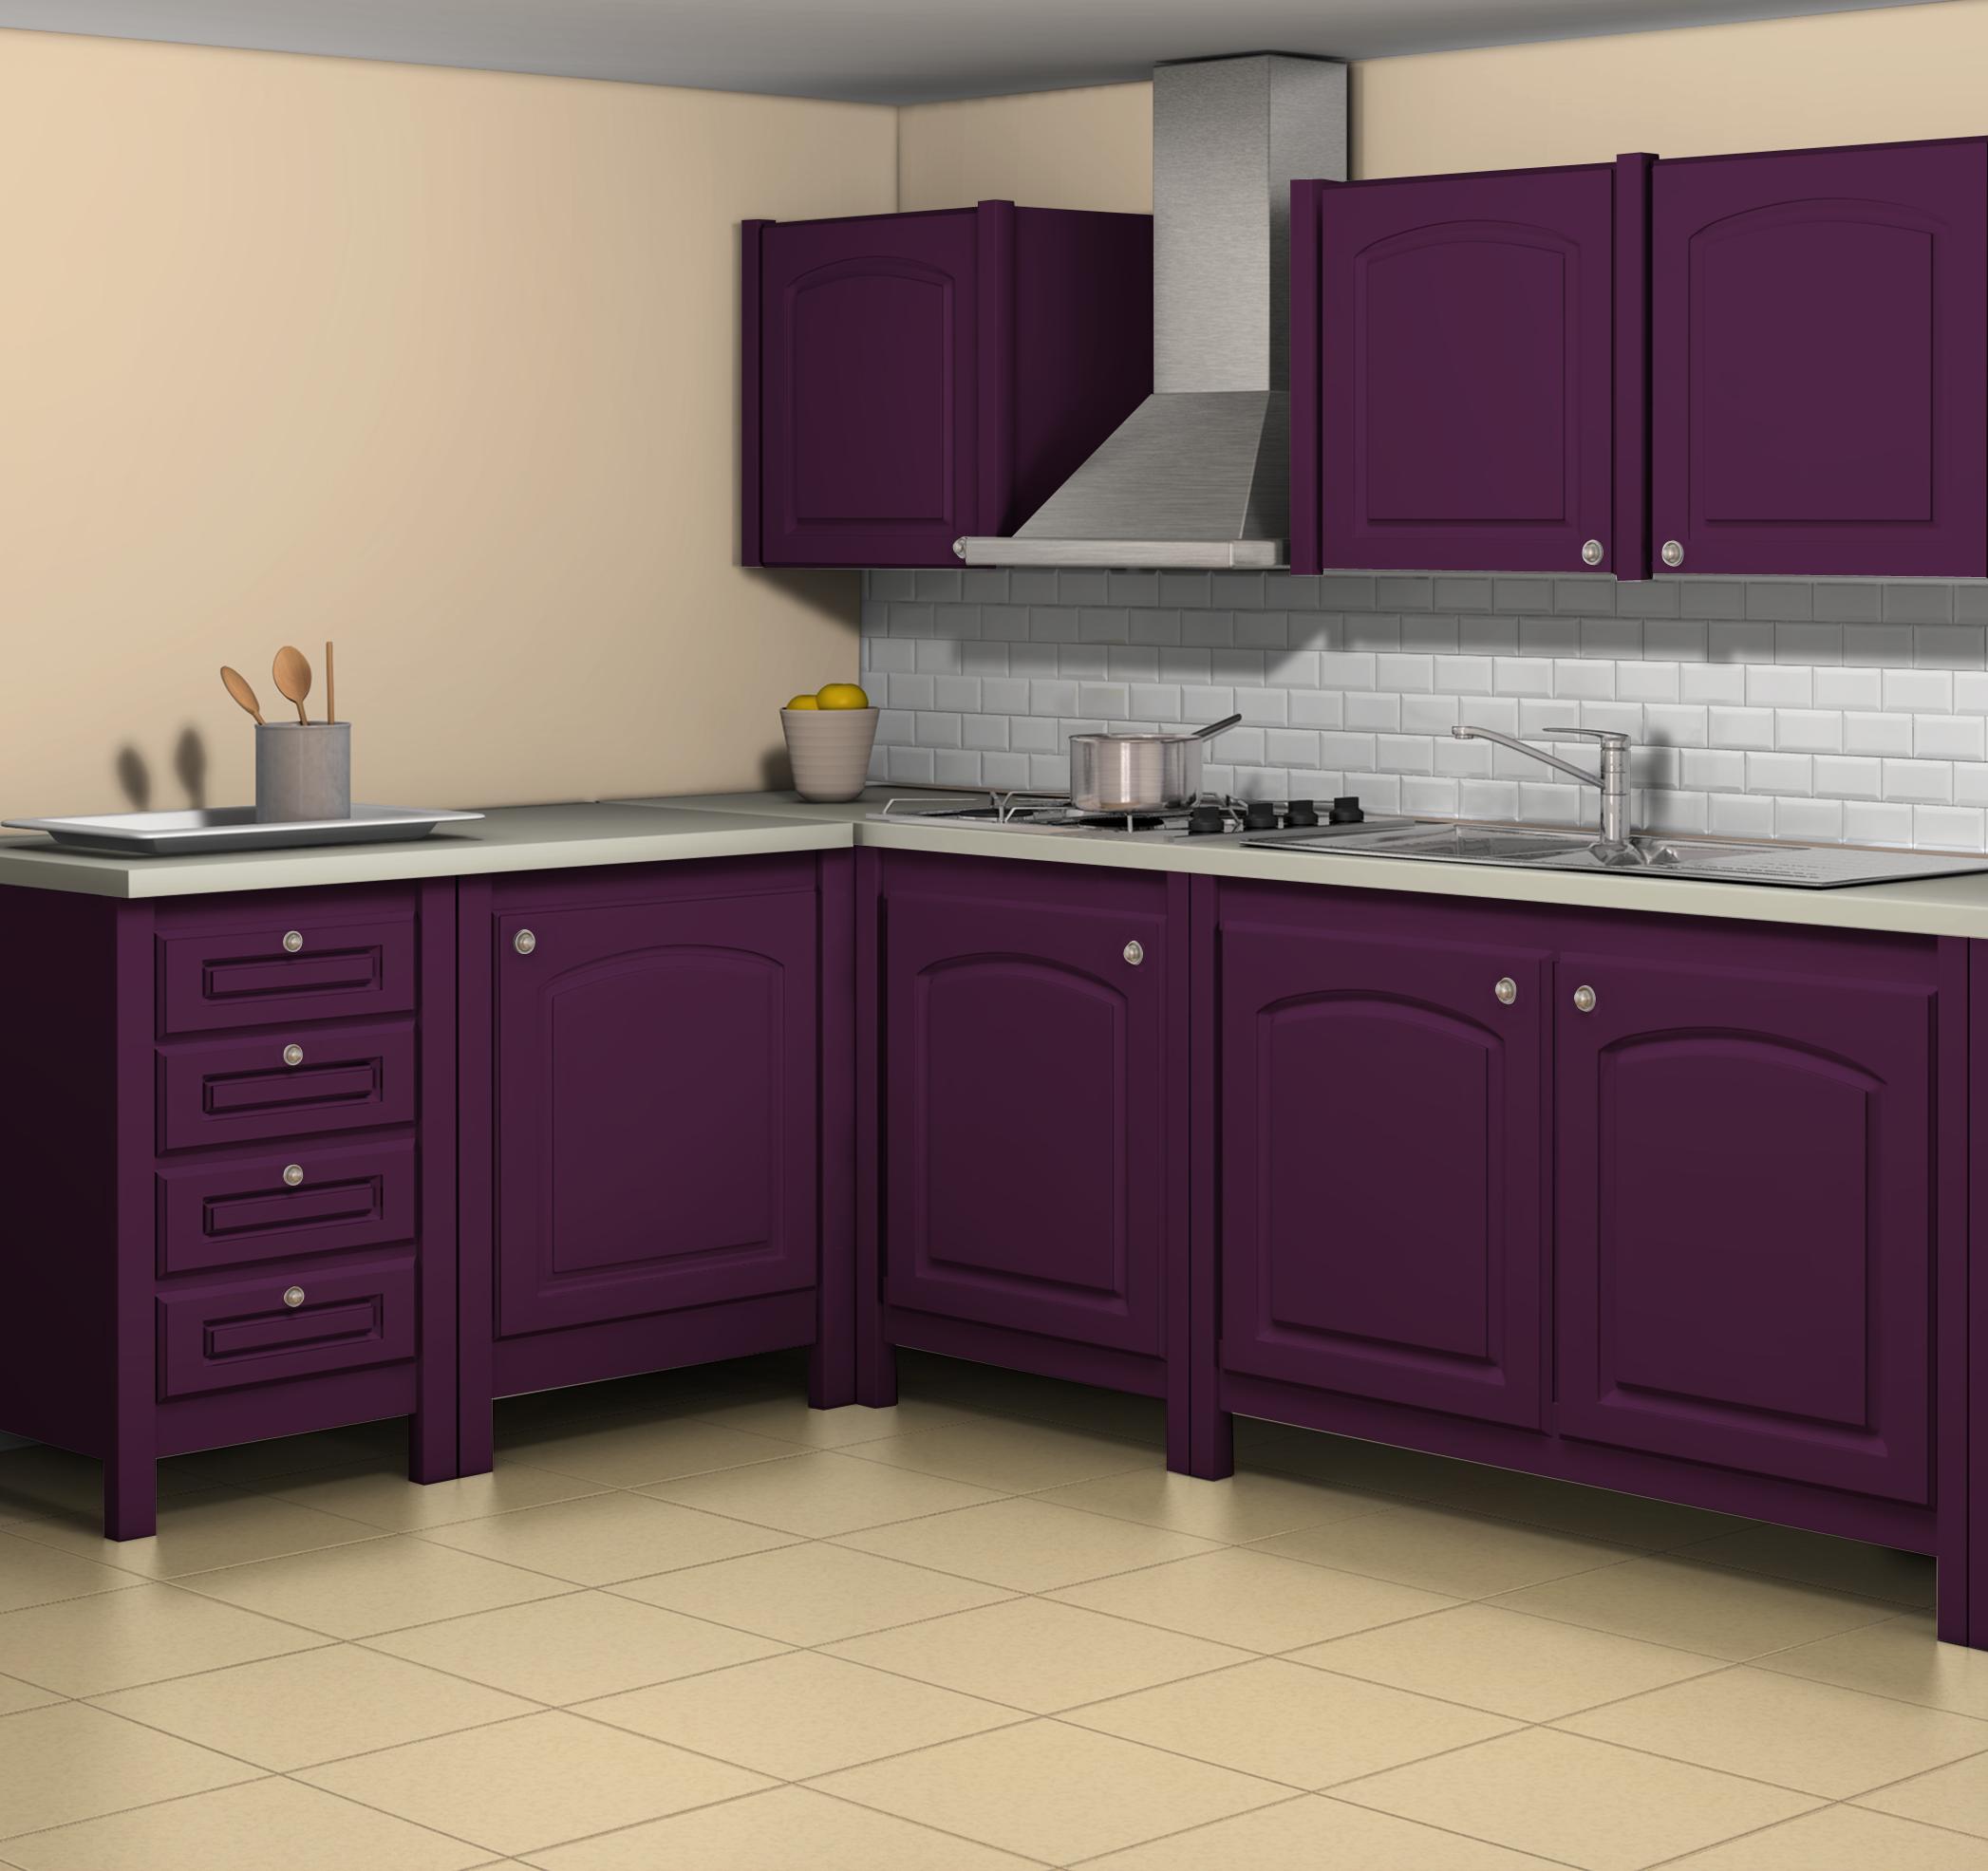 Esprit campagne simulation avec la teinte aubergine - Facade meuble de cuisine ...